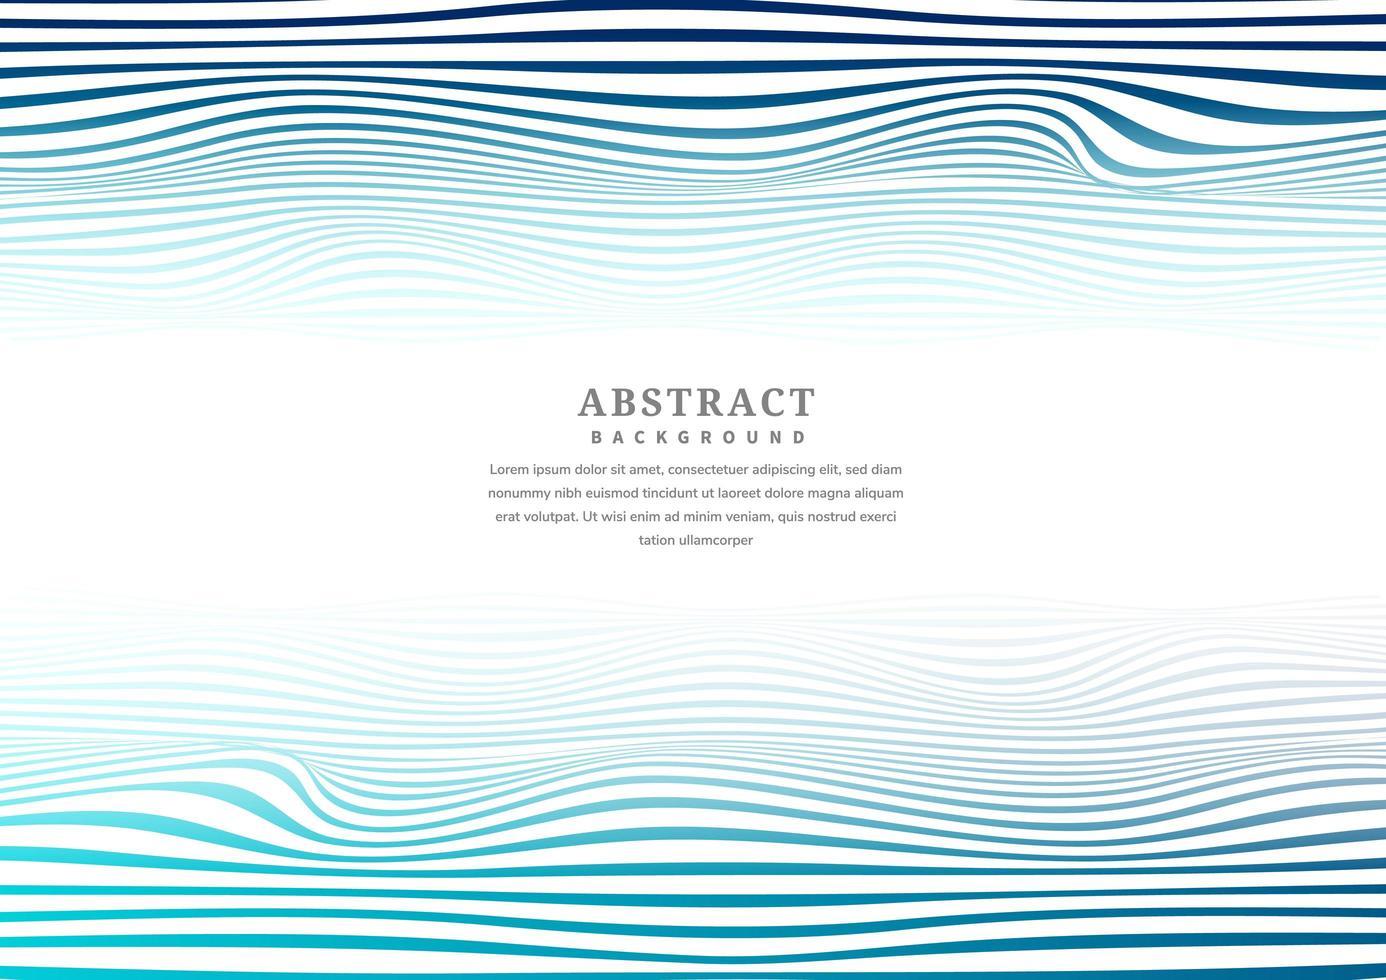 líneas azules abstractas y patrón de rayas onduladas vector